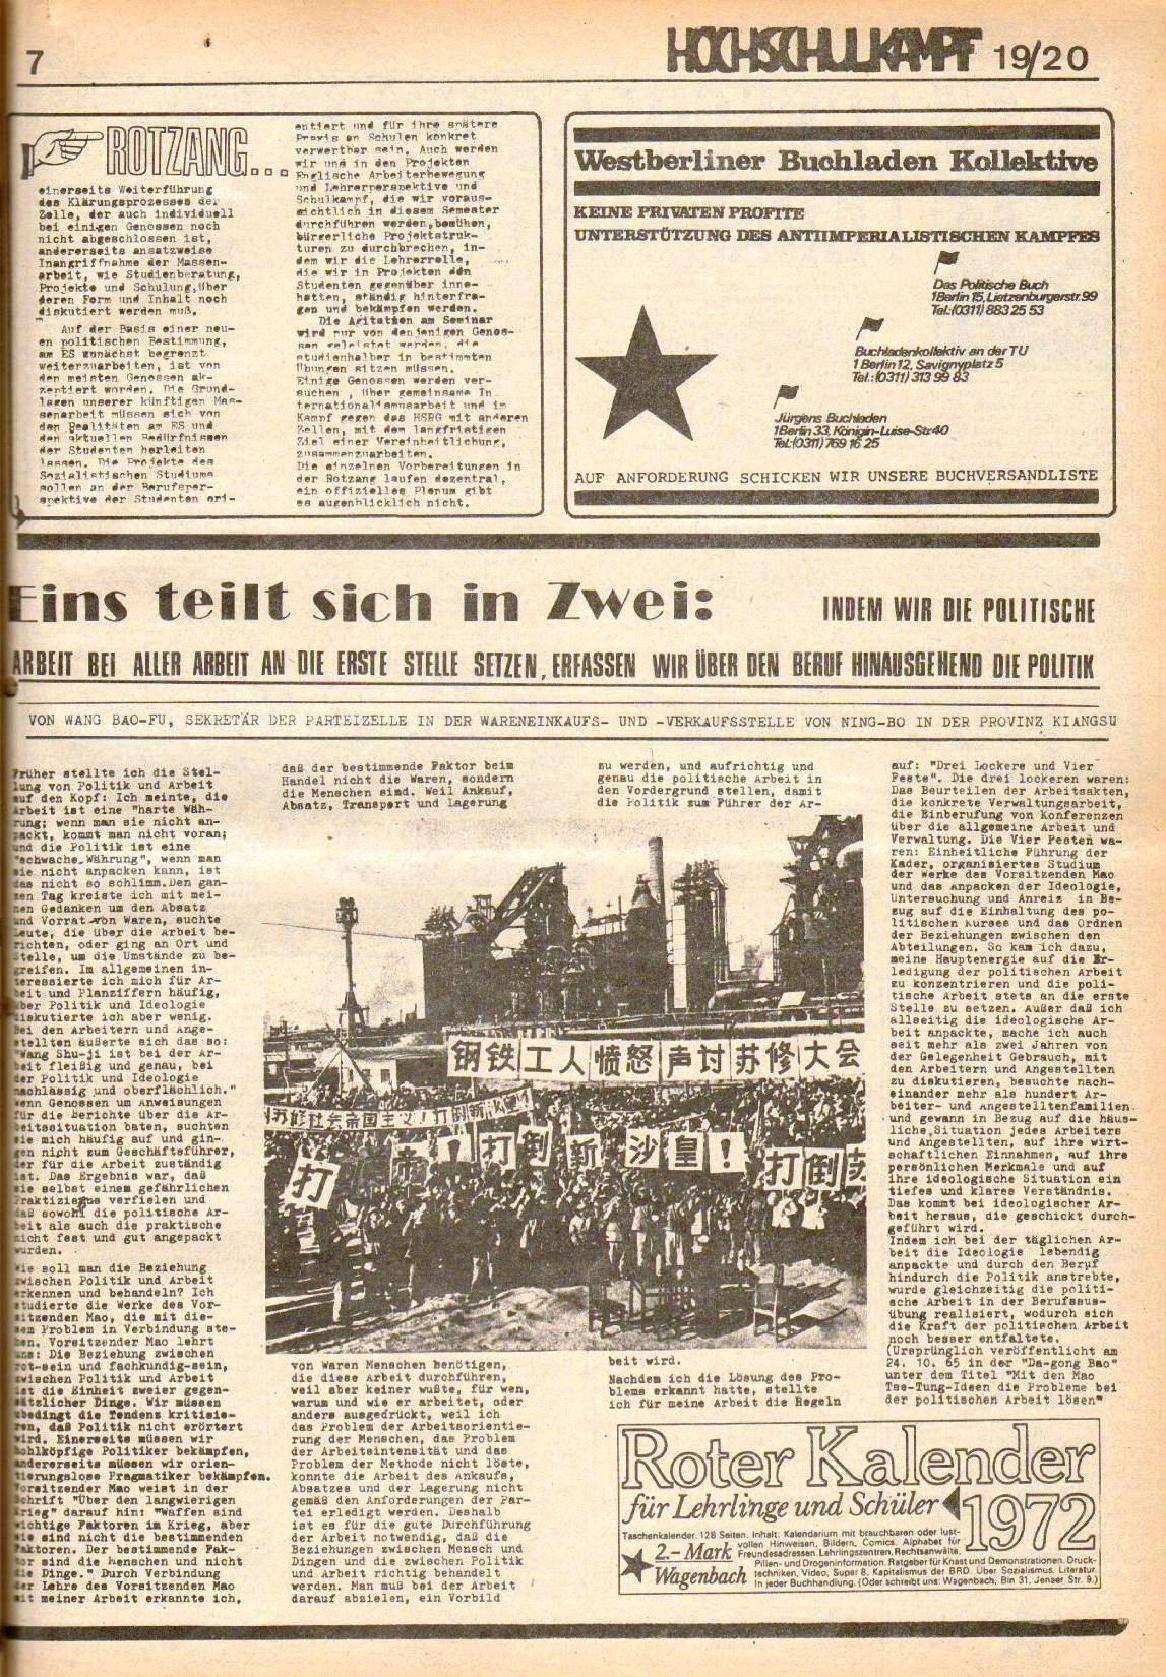 Berlin_Hochschulkampf_1971_19_07